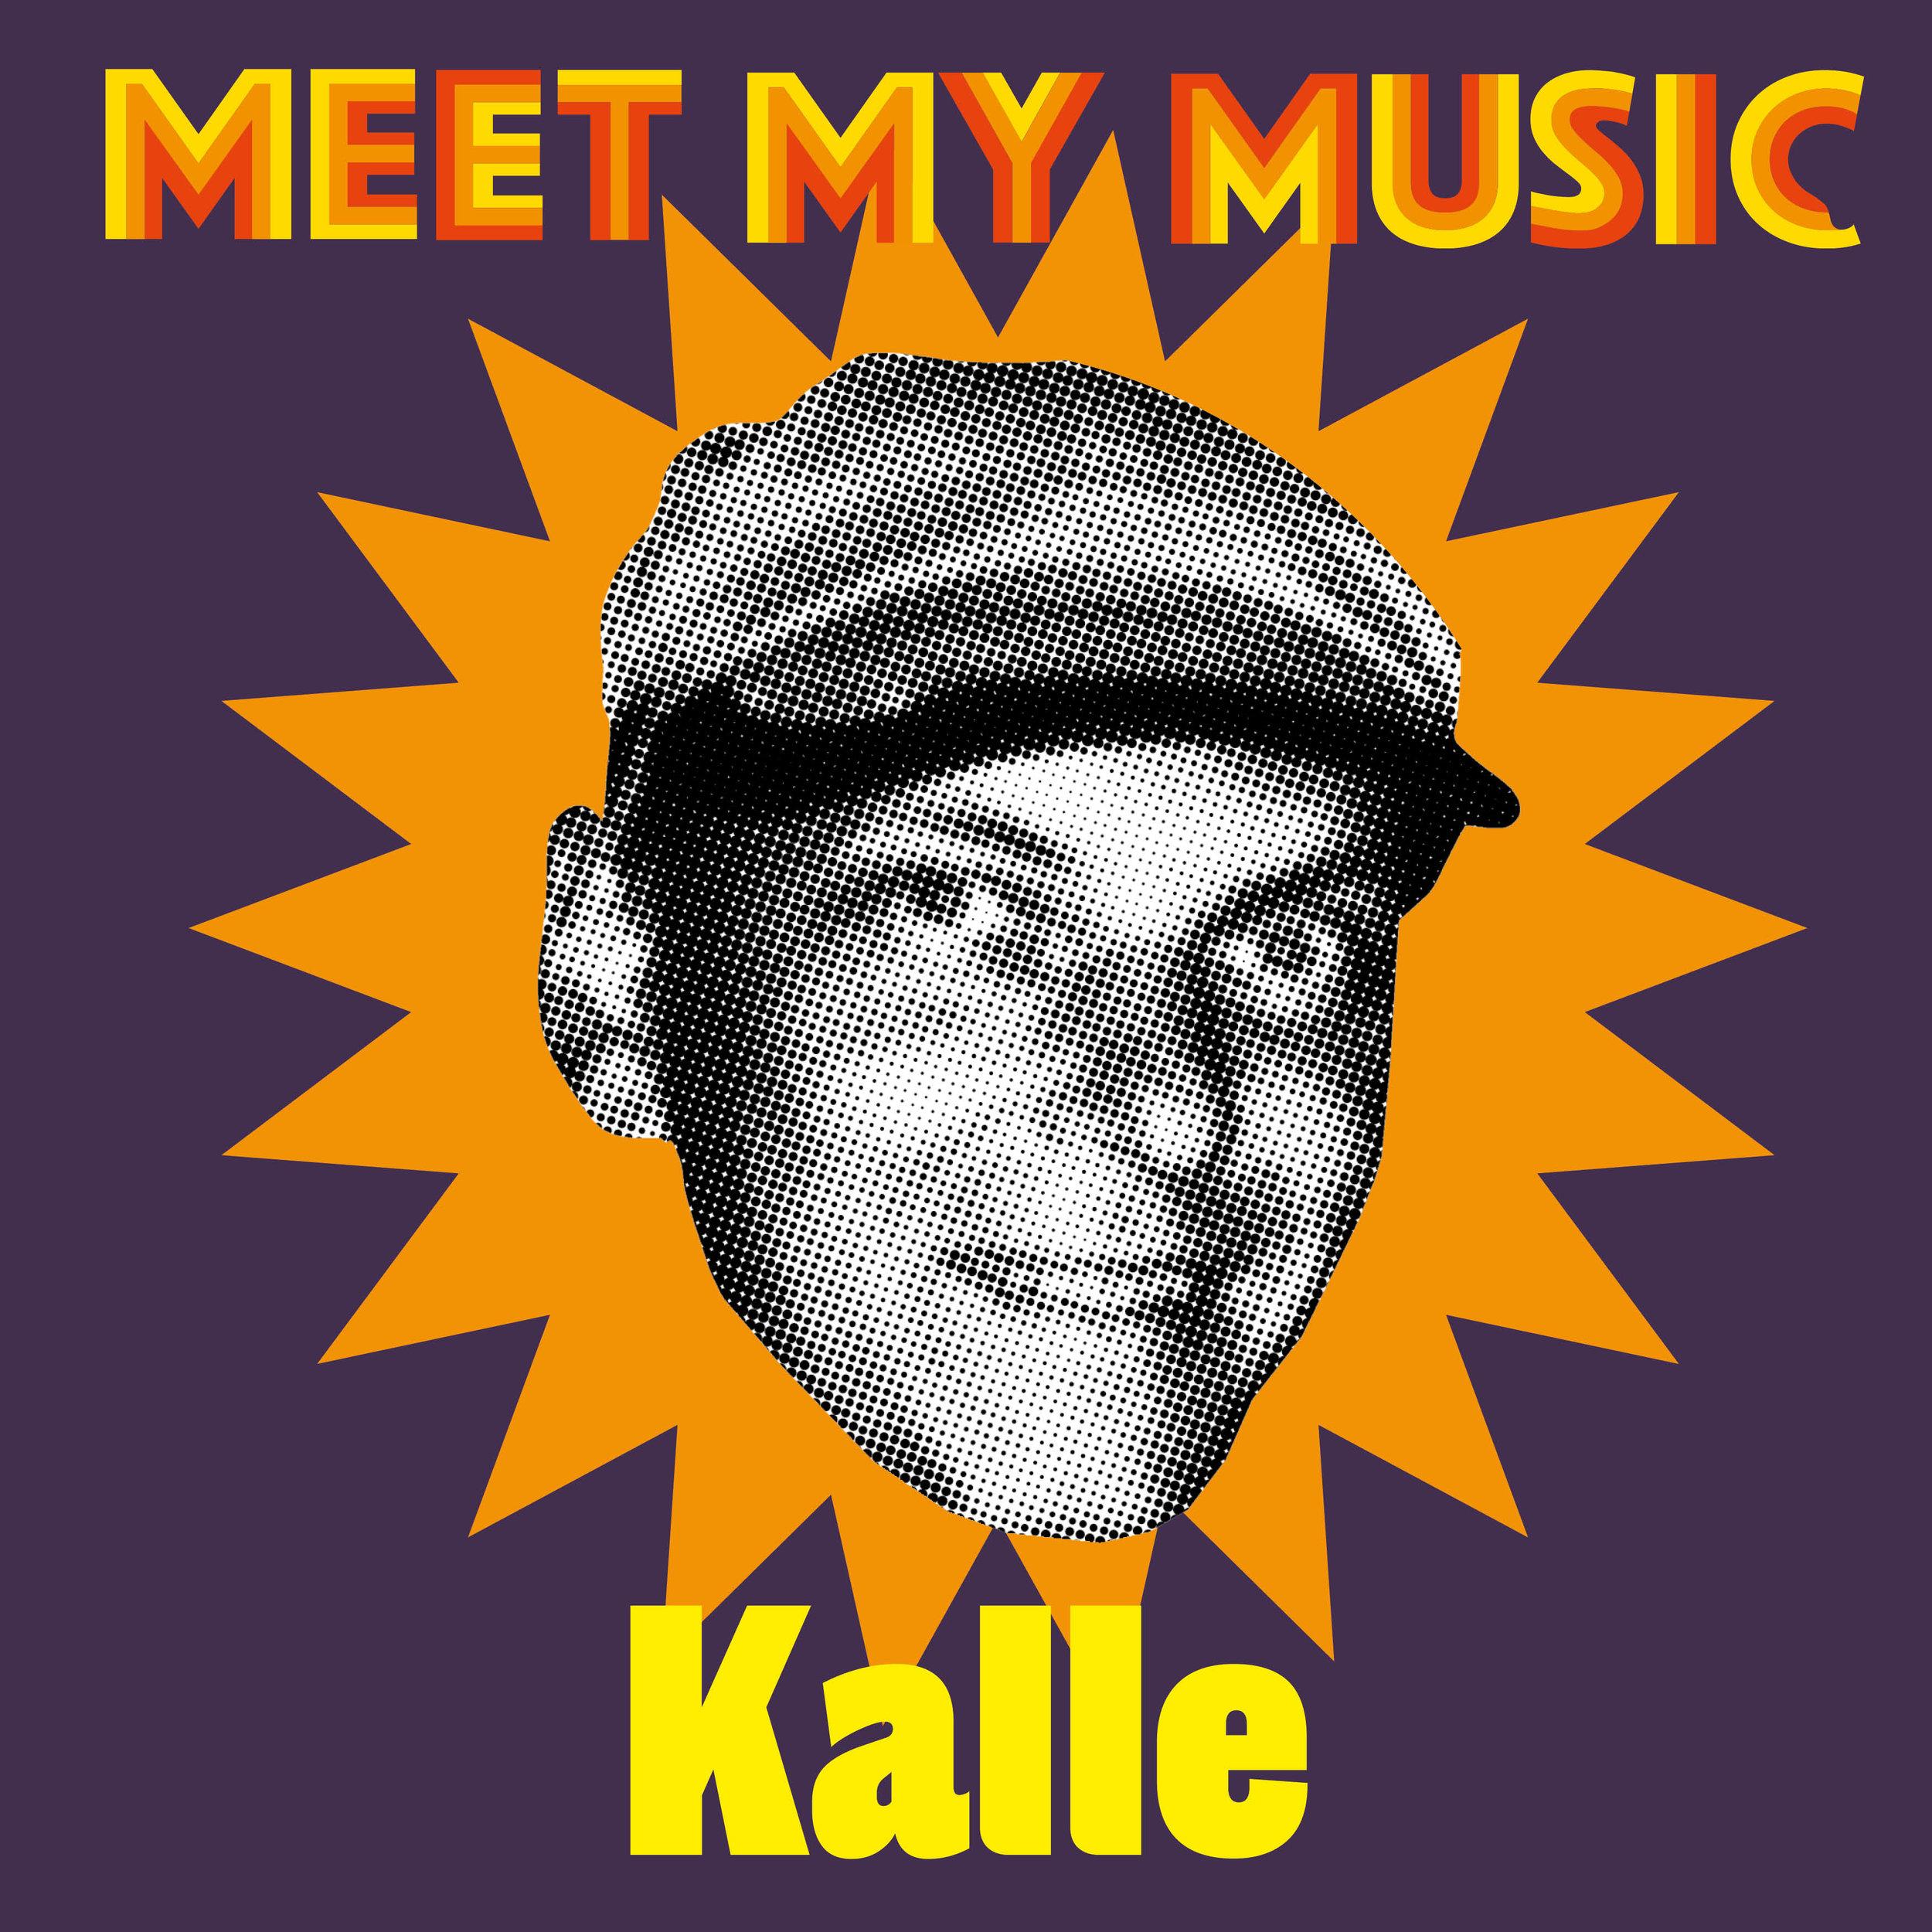 Meet my music Kalle.jpg